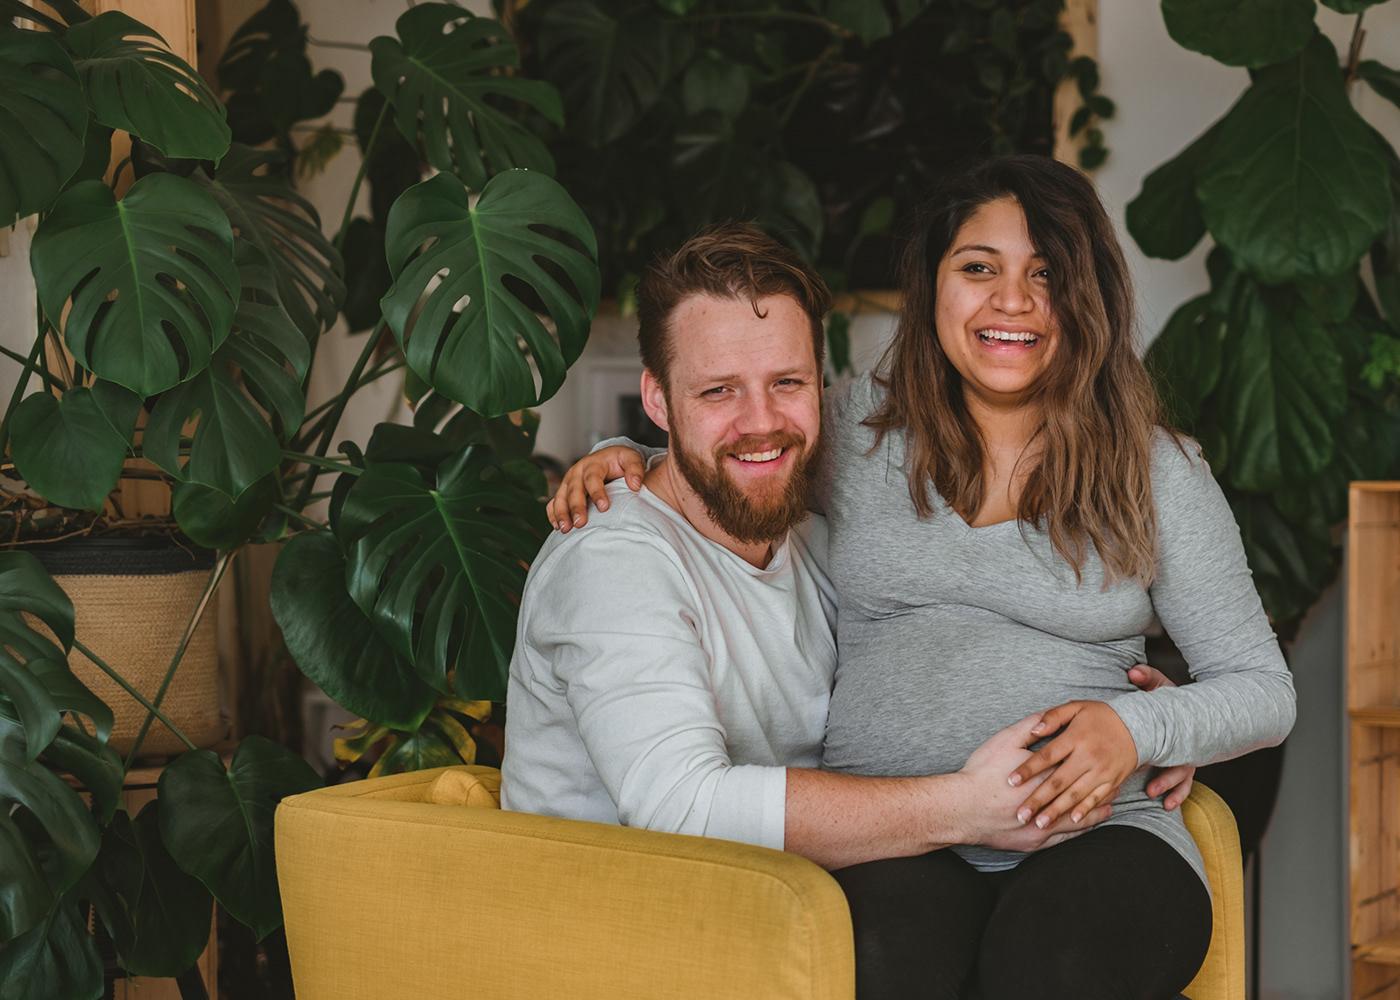 baby couples portrait Natural lighting Photography  photoshoot portrait portraits pregnancy